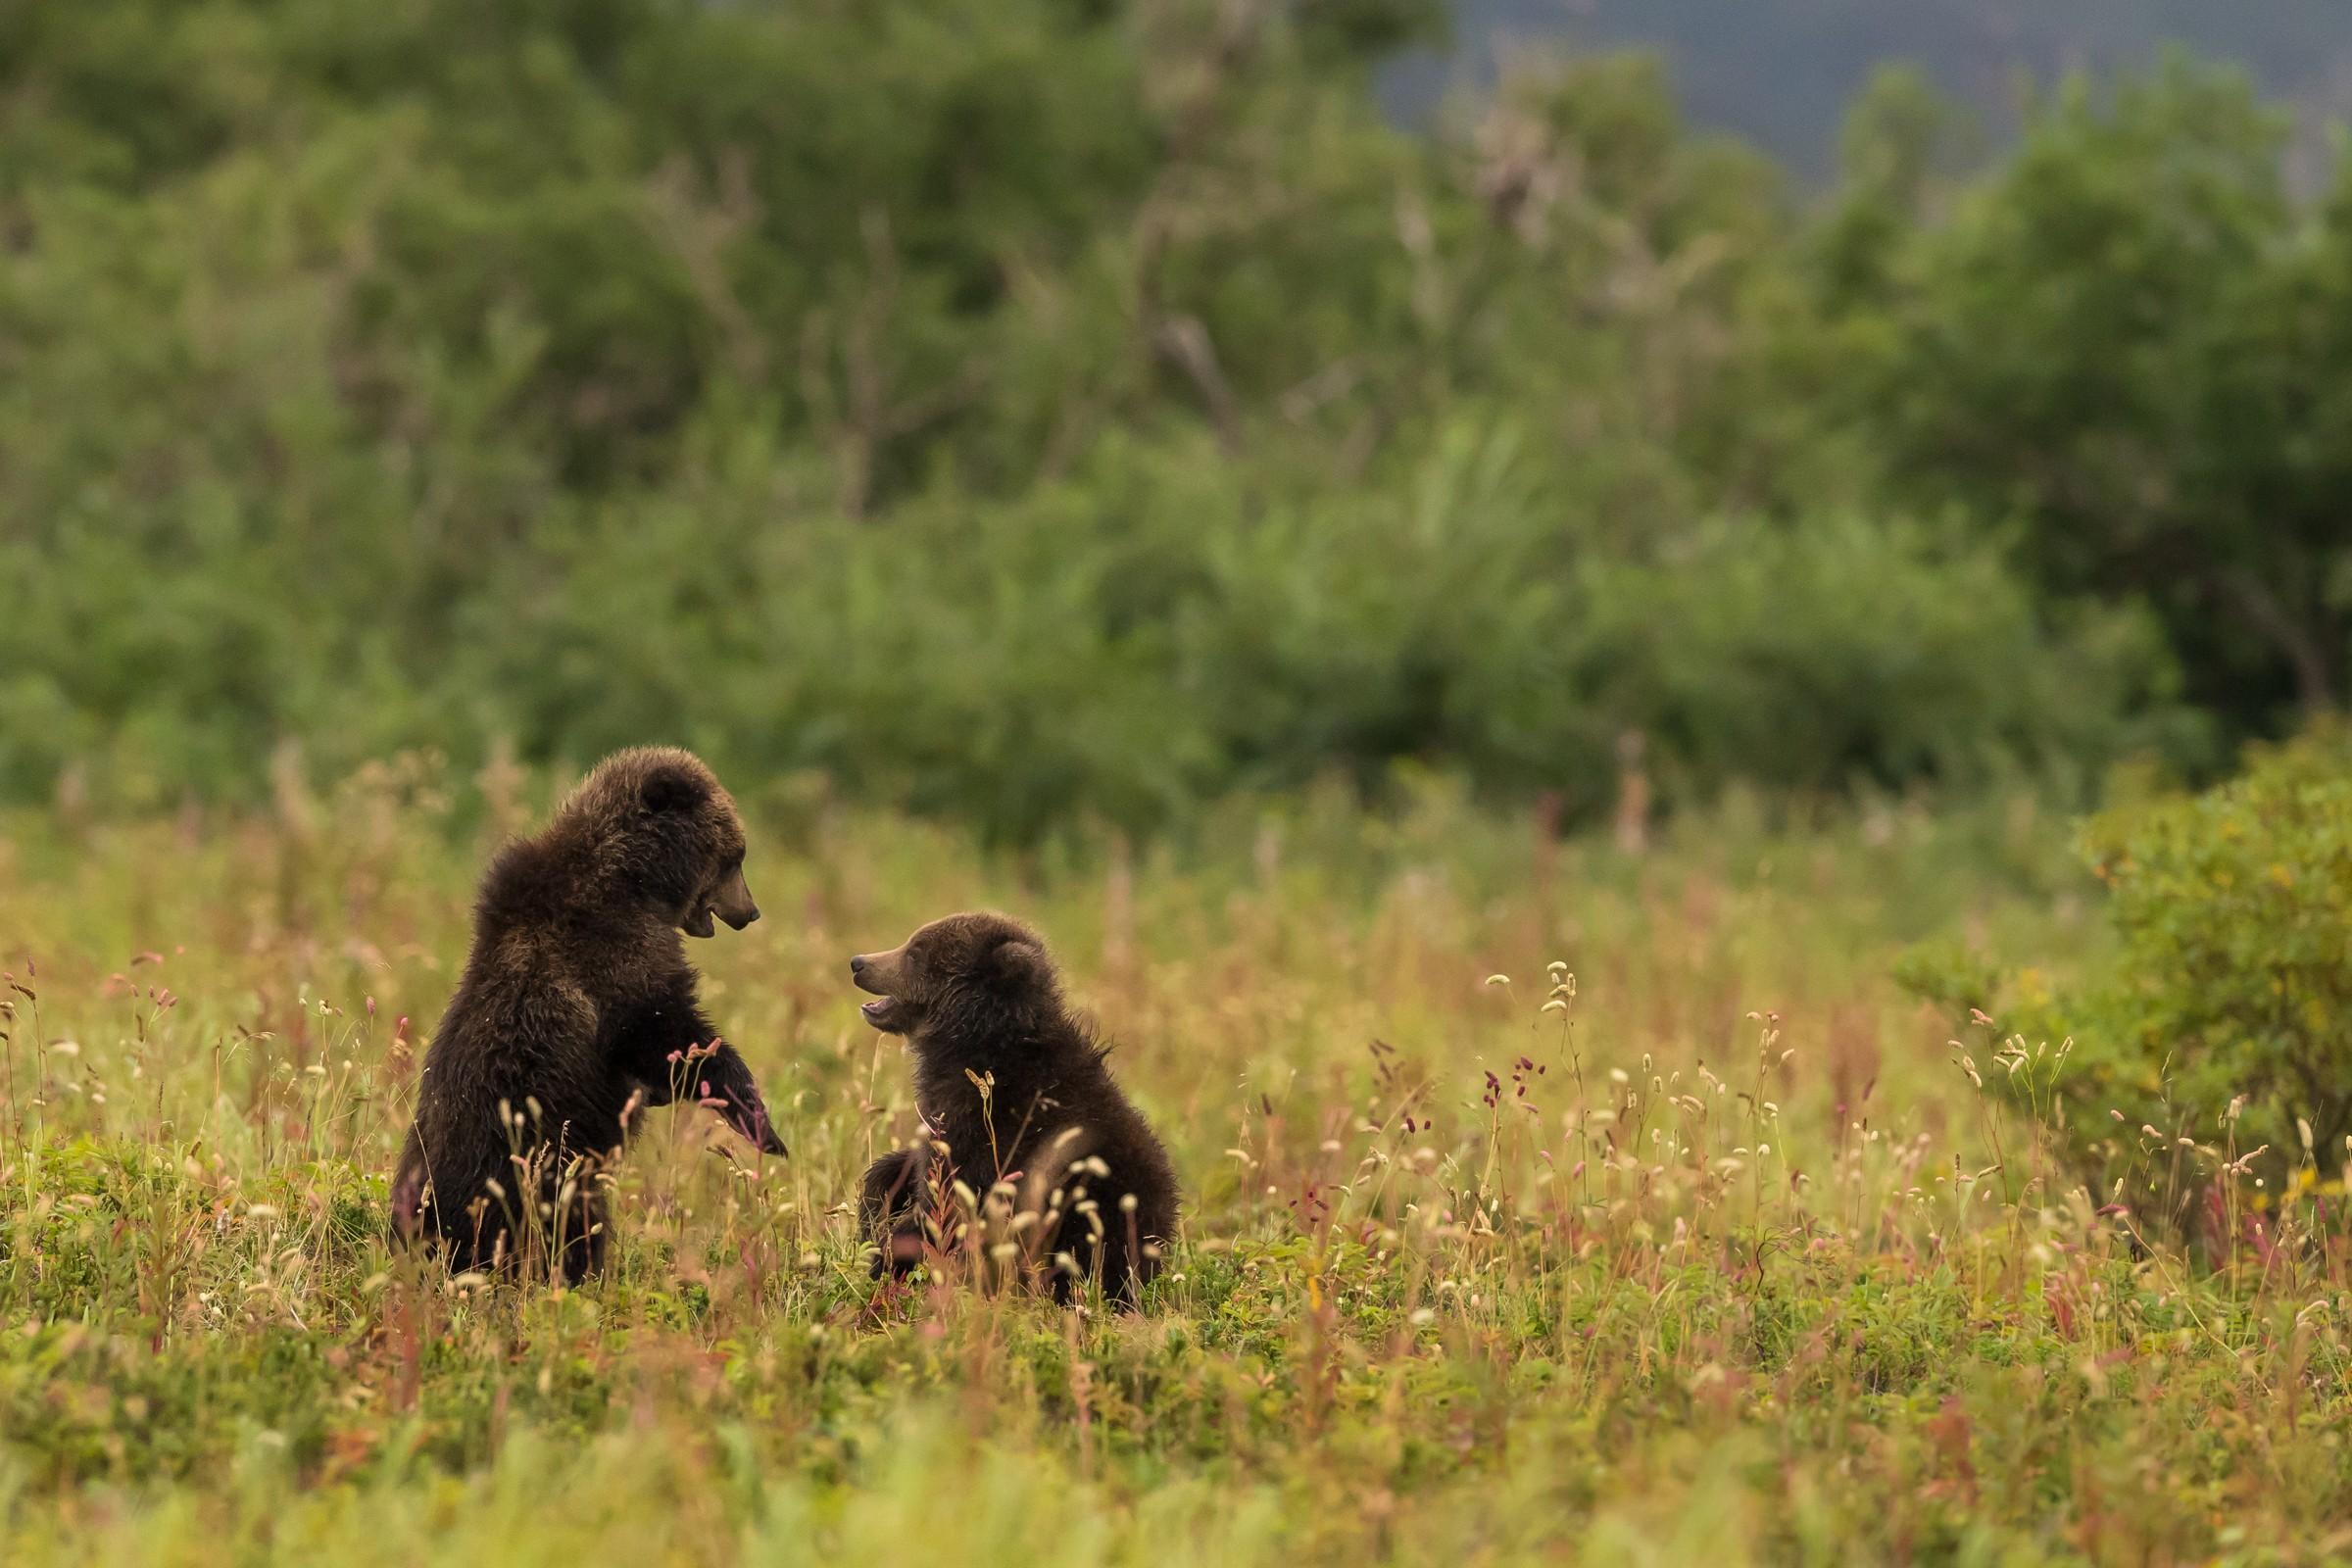 wildlife kamchatka 2595